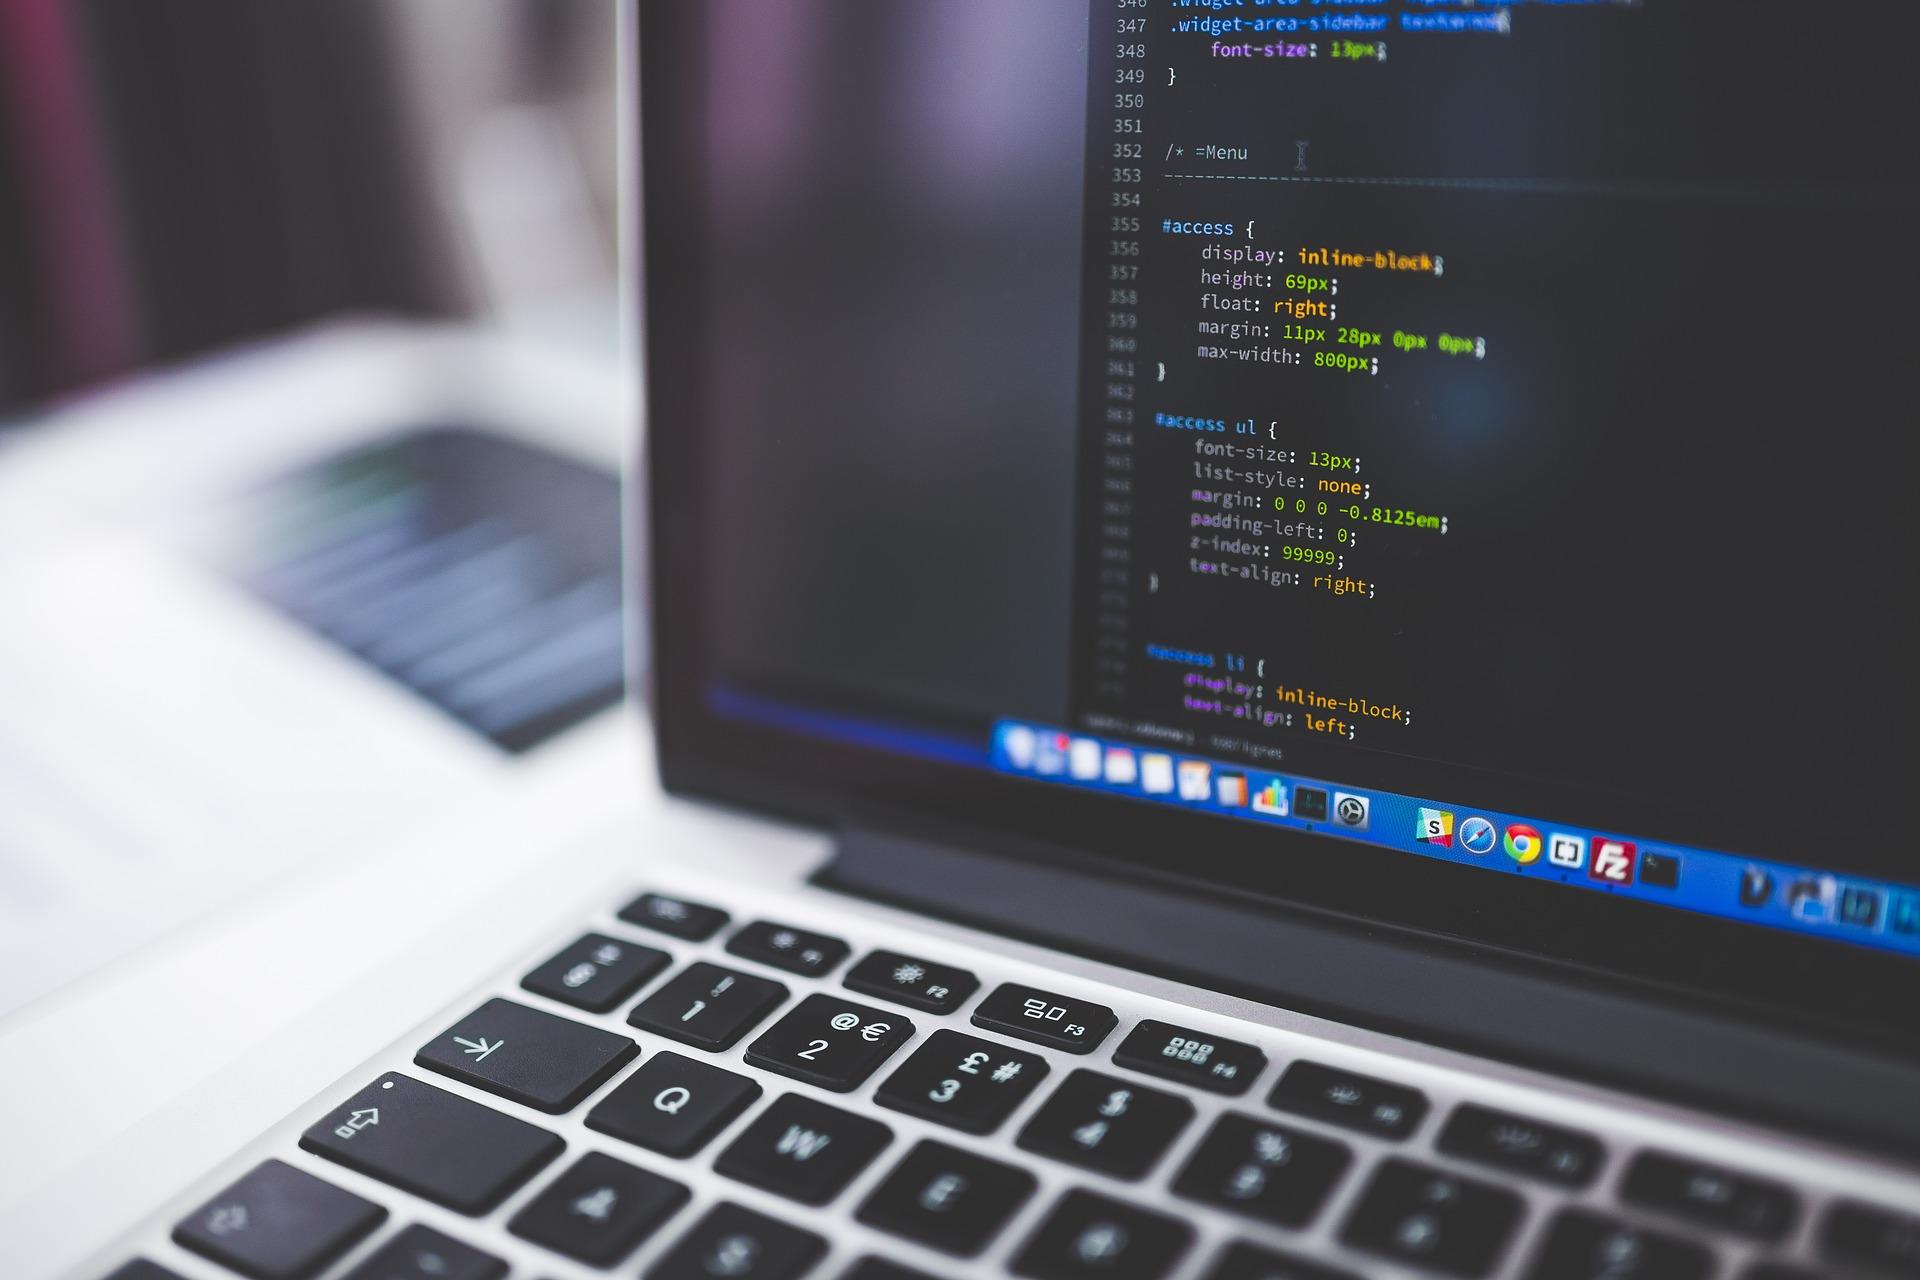 5 Herramientas de programación que serán tendencia en 2019